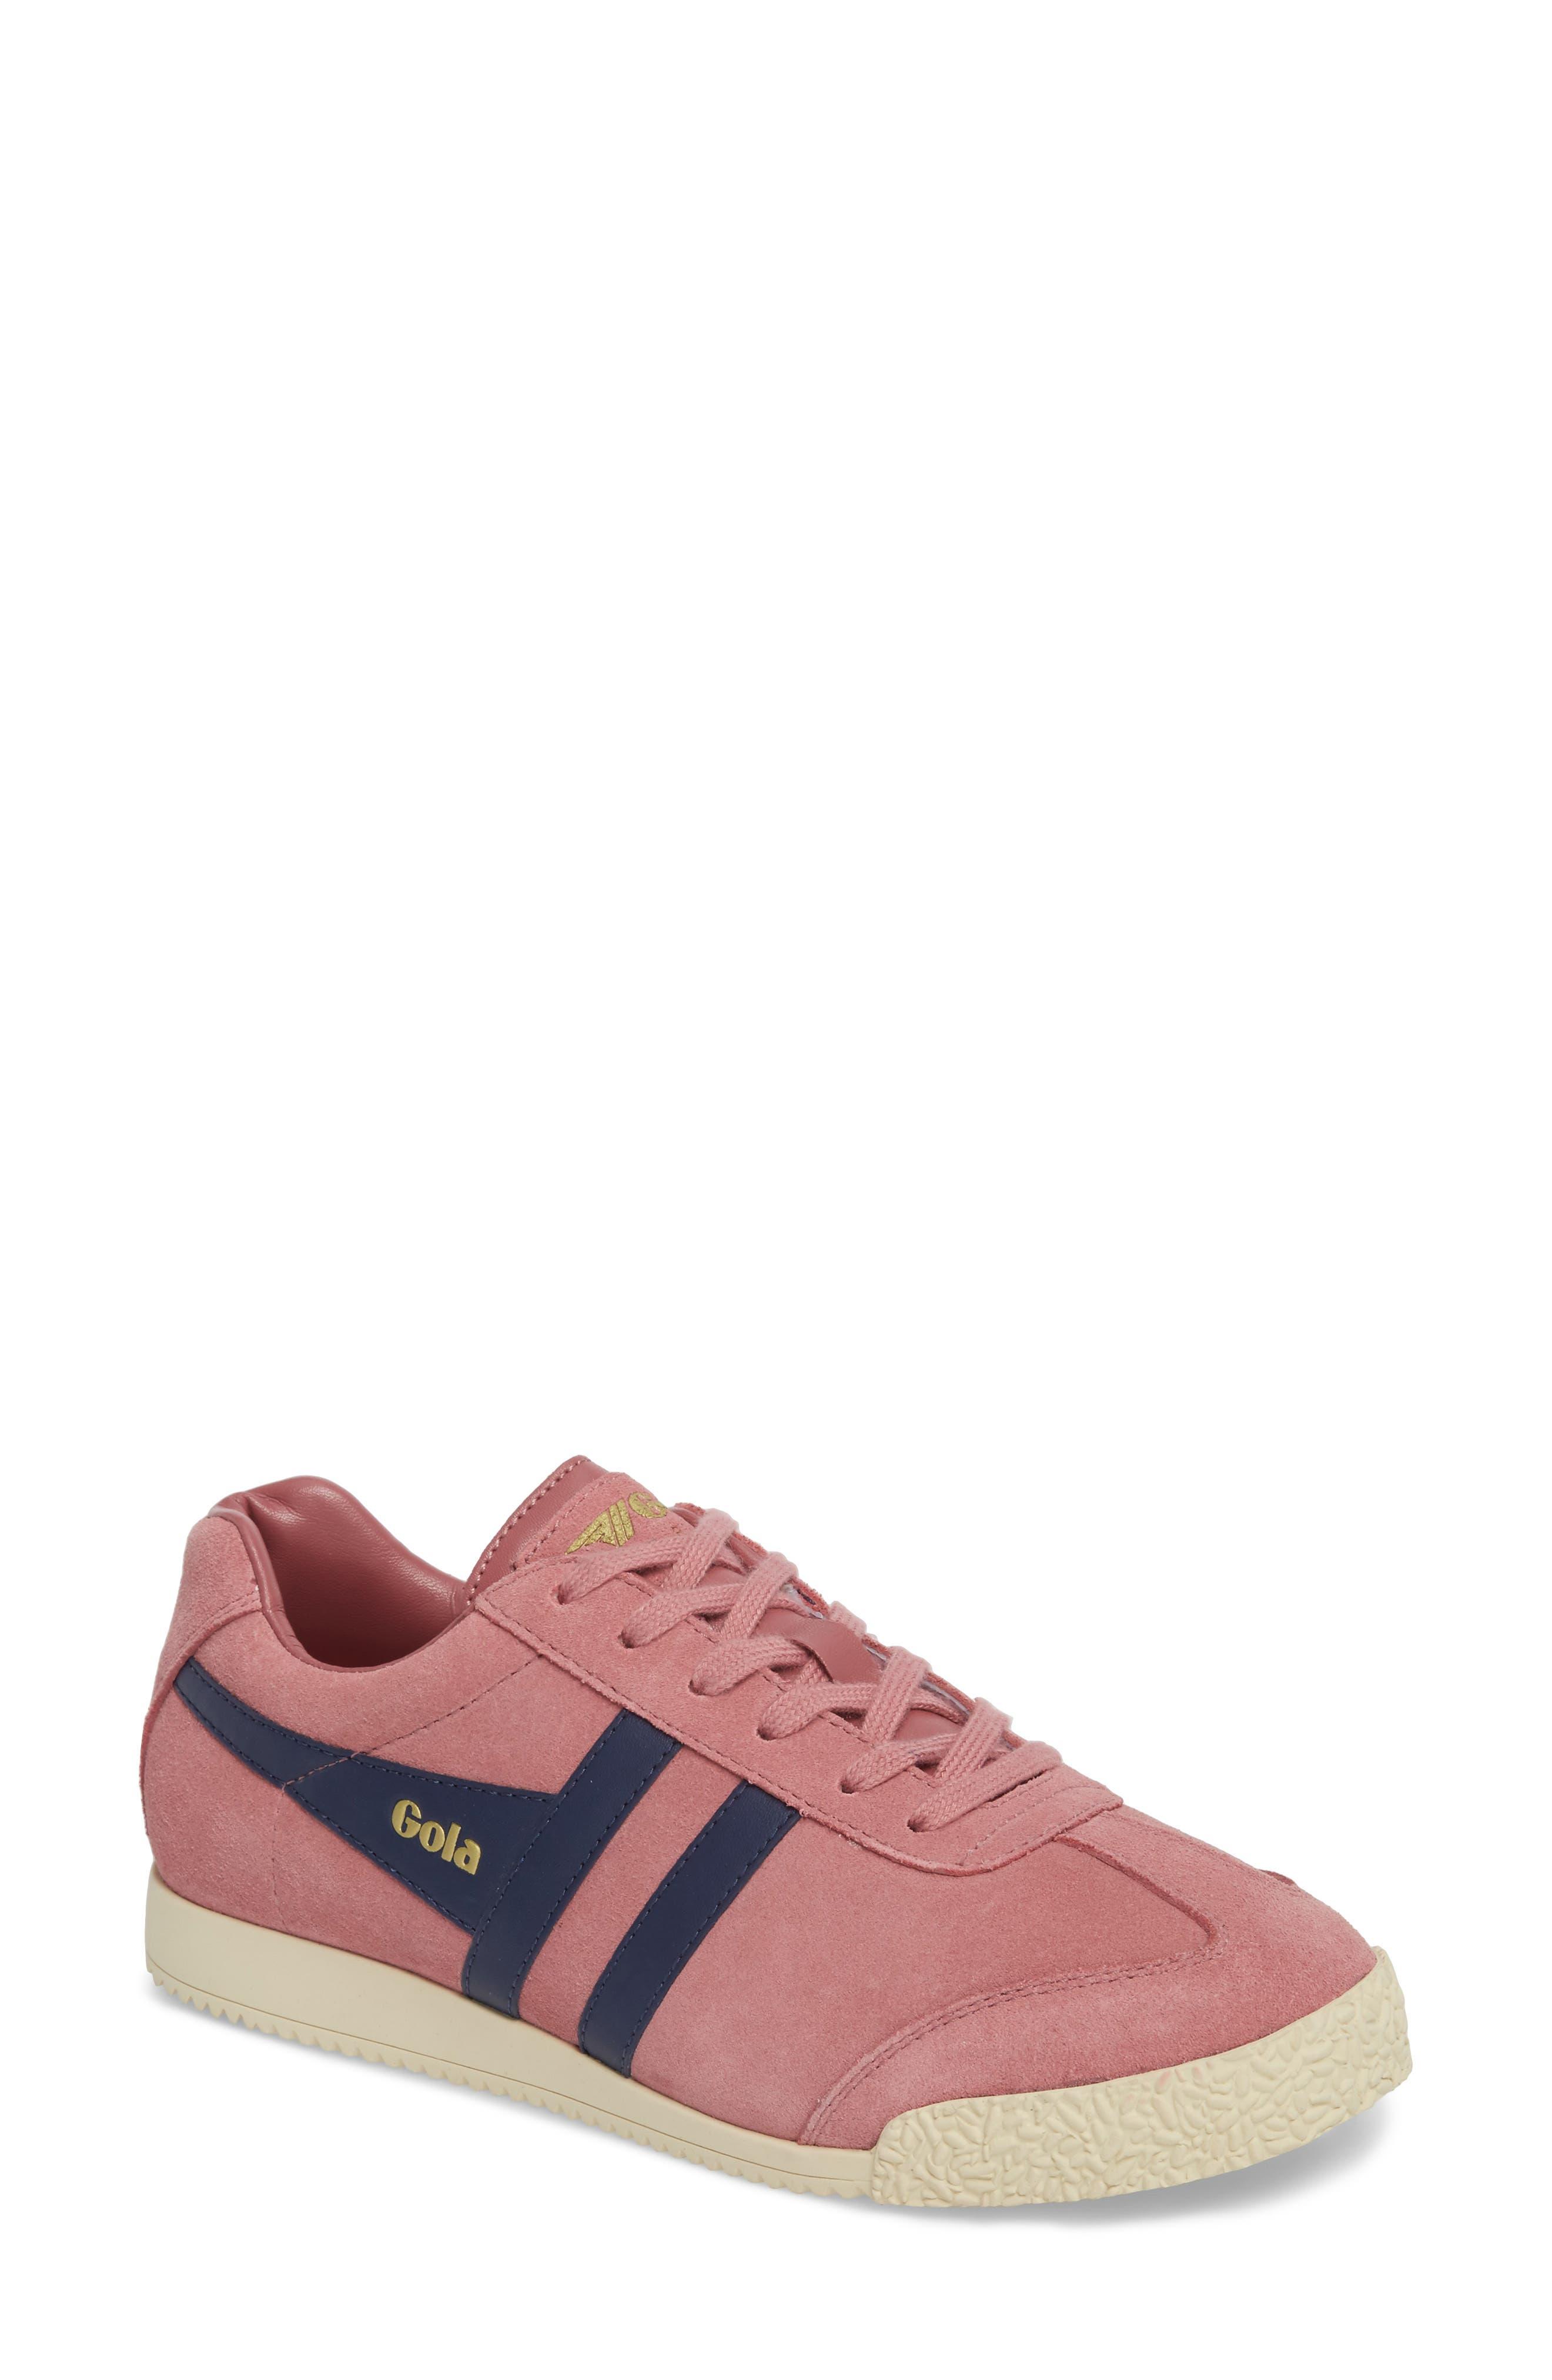 Harrier Suede Low Top Sneaker,                         Main,                         color, Dusty Rose/ Navy